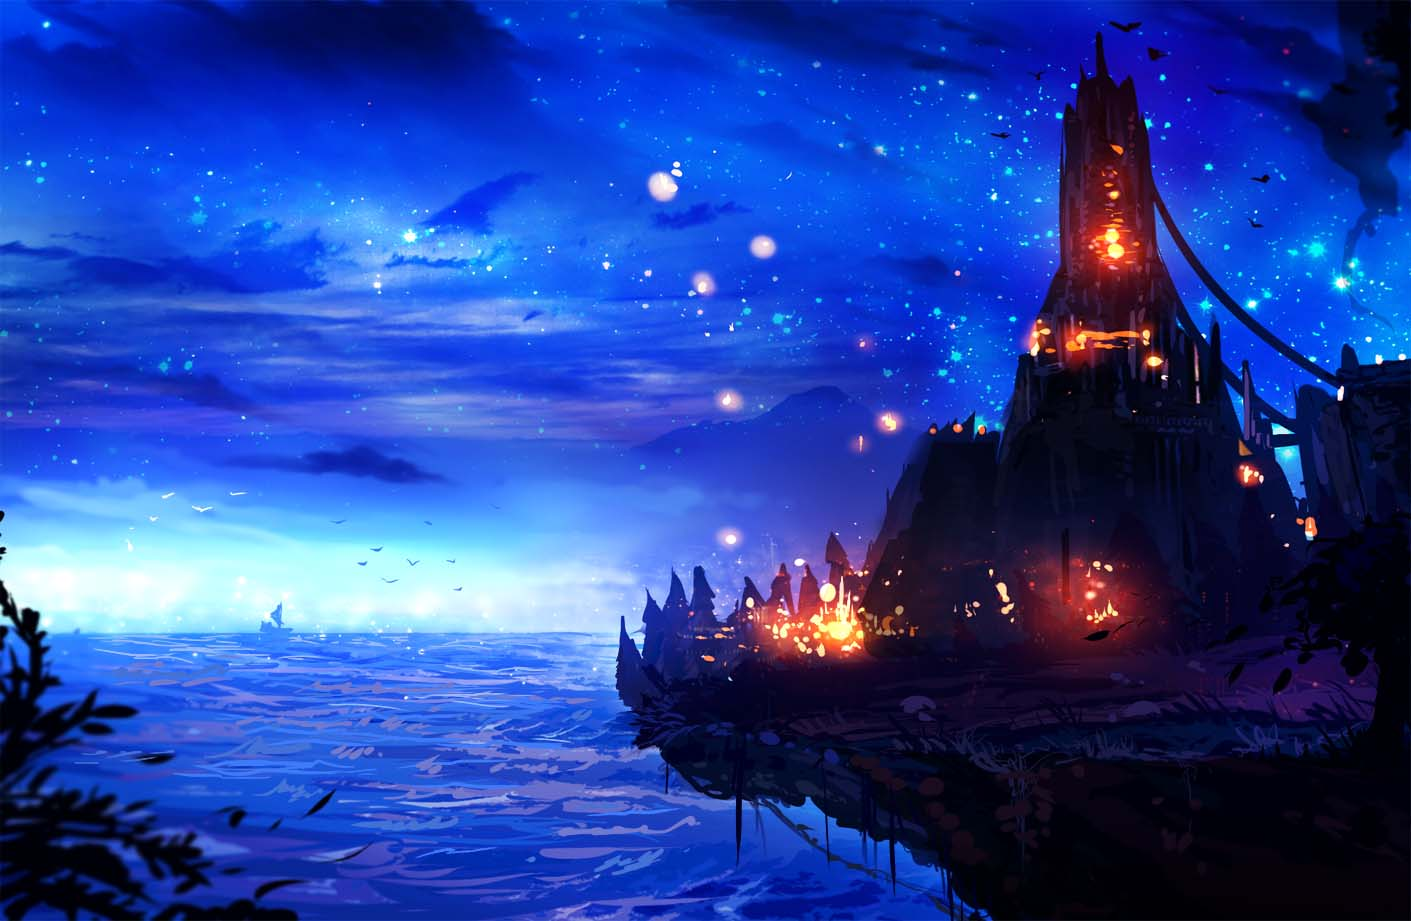 Anime galaxy cực đẹp